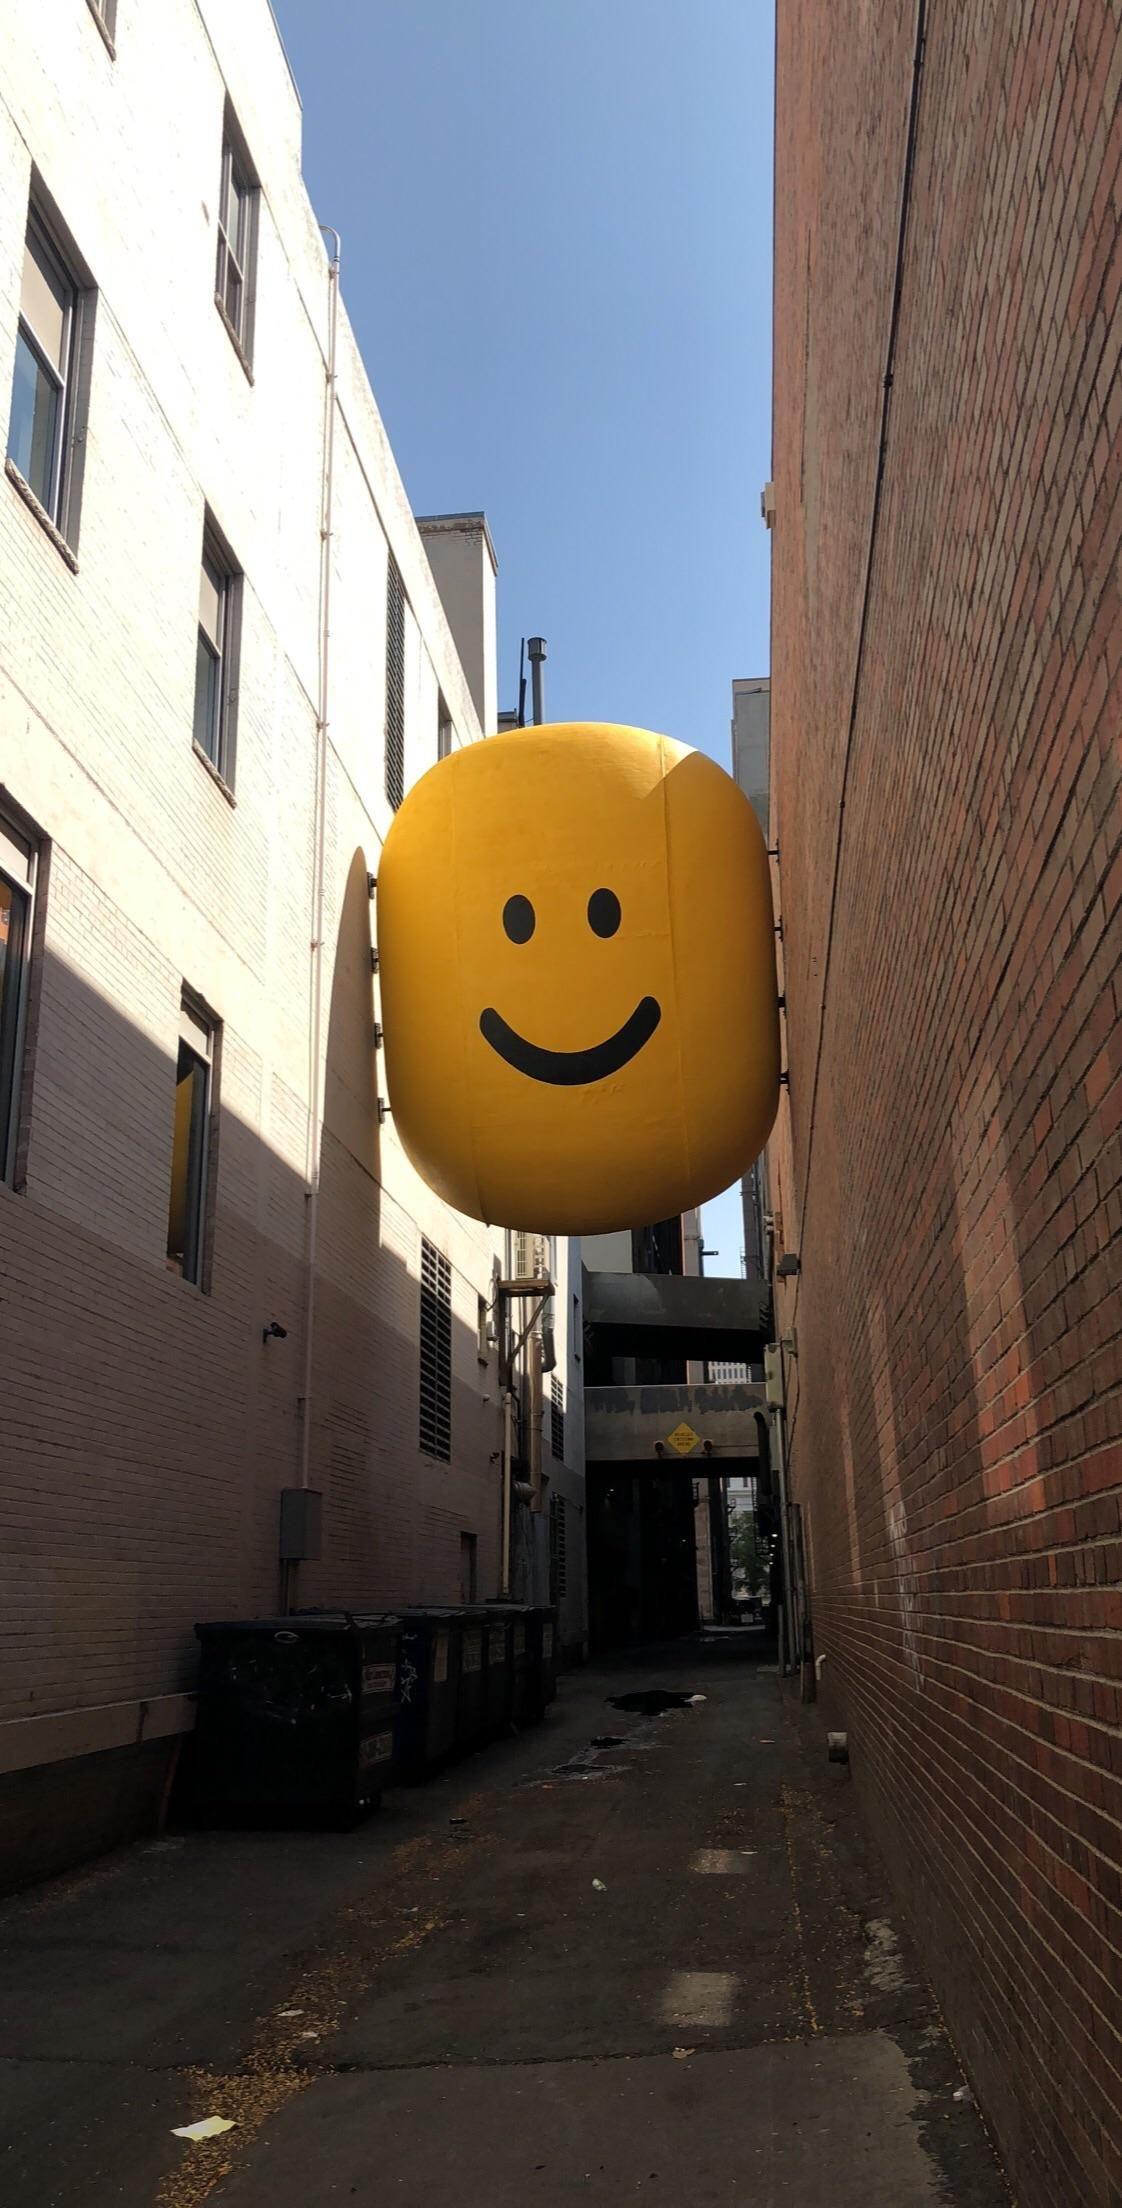 I Found A Giant Roblox Like Smiley Face In An Alley Way In Denver Colorado Roblox Denver Colorado Colorado